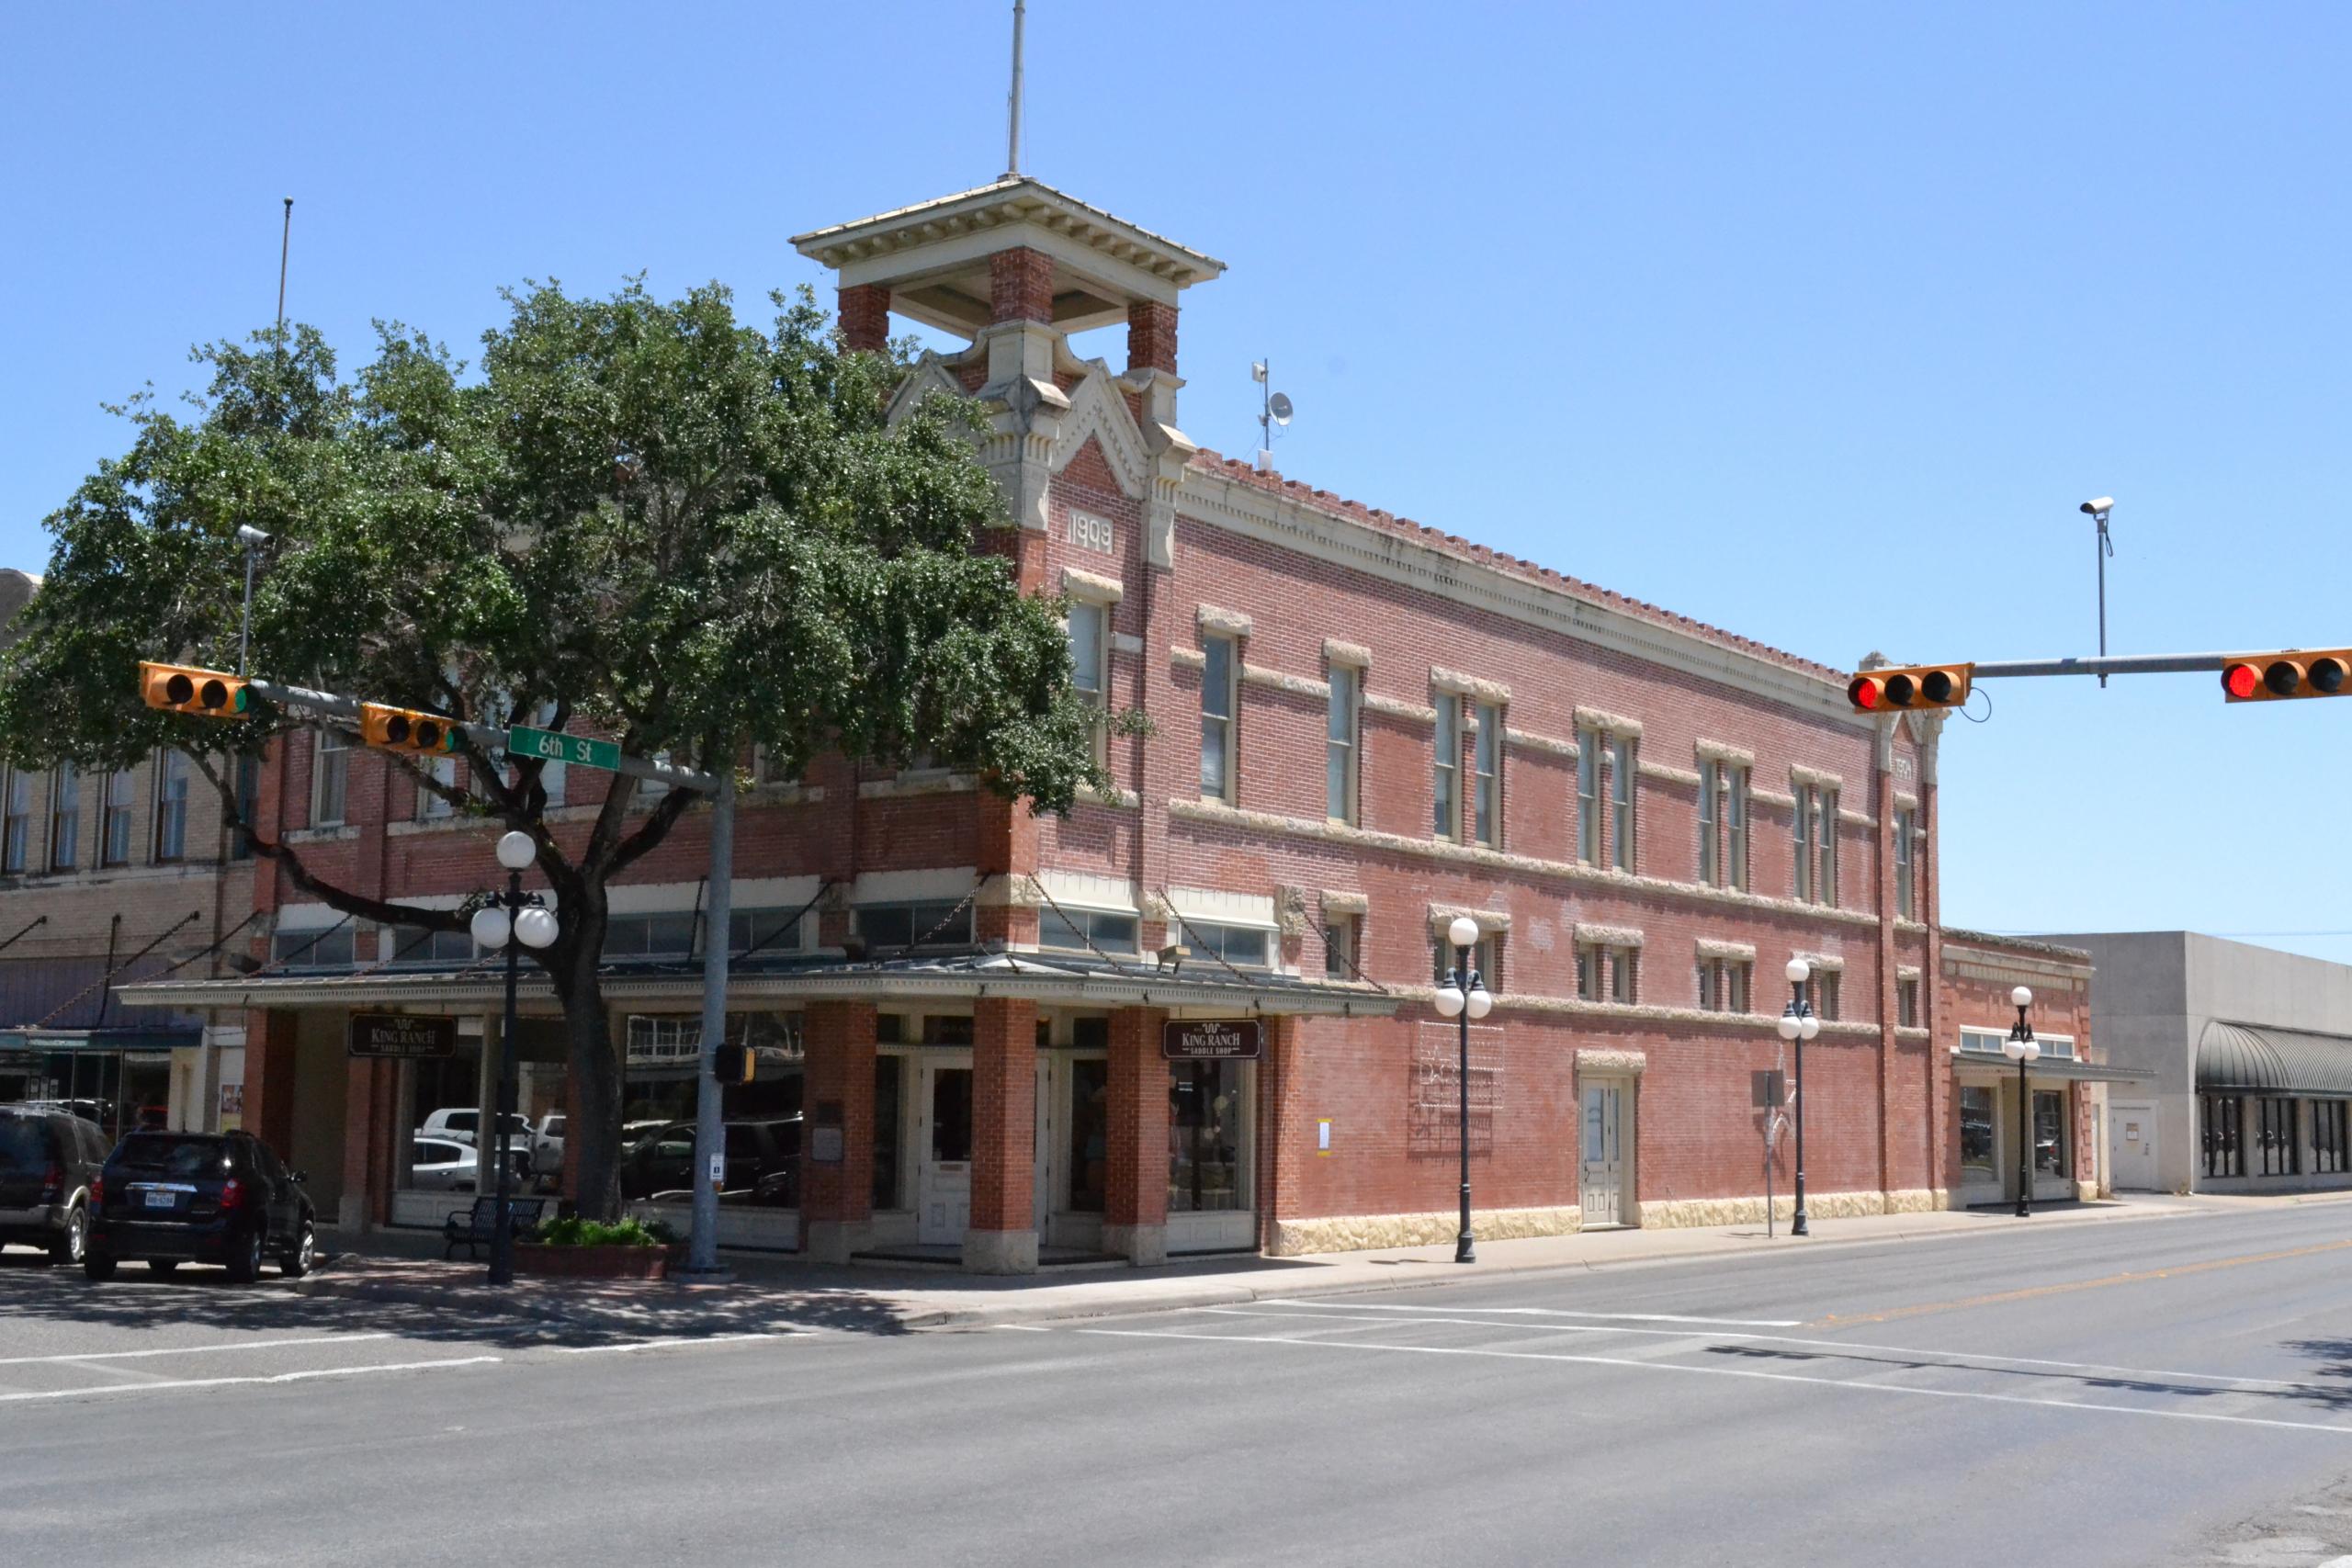 Downtown Kingsville